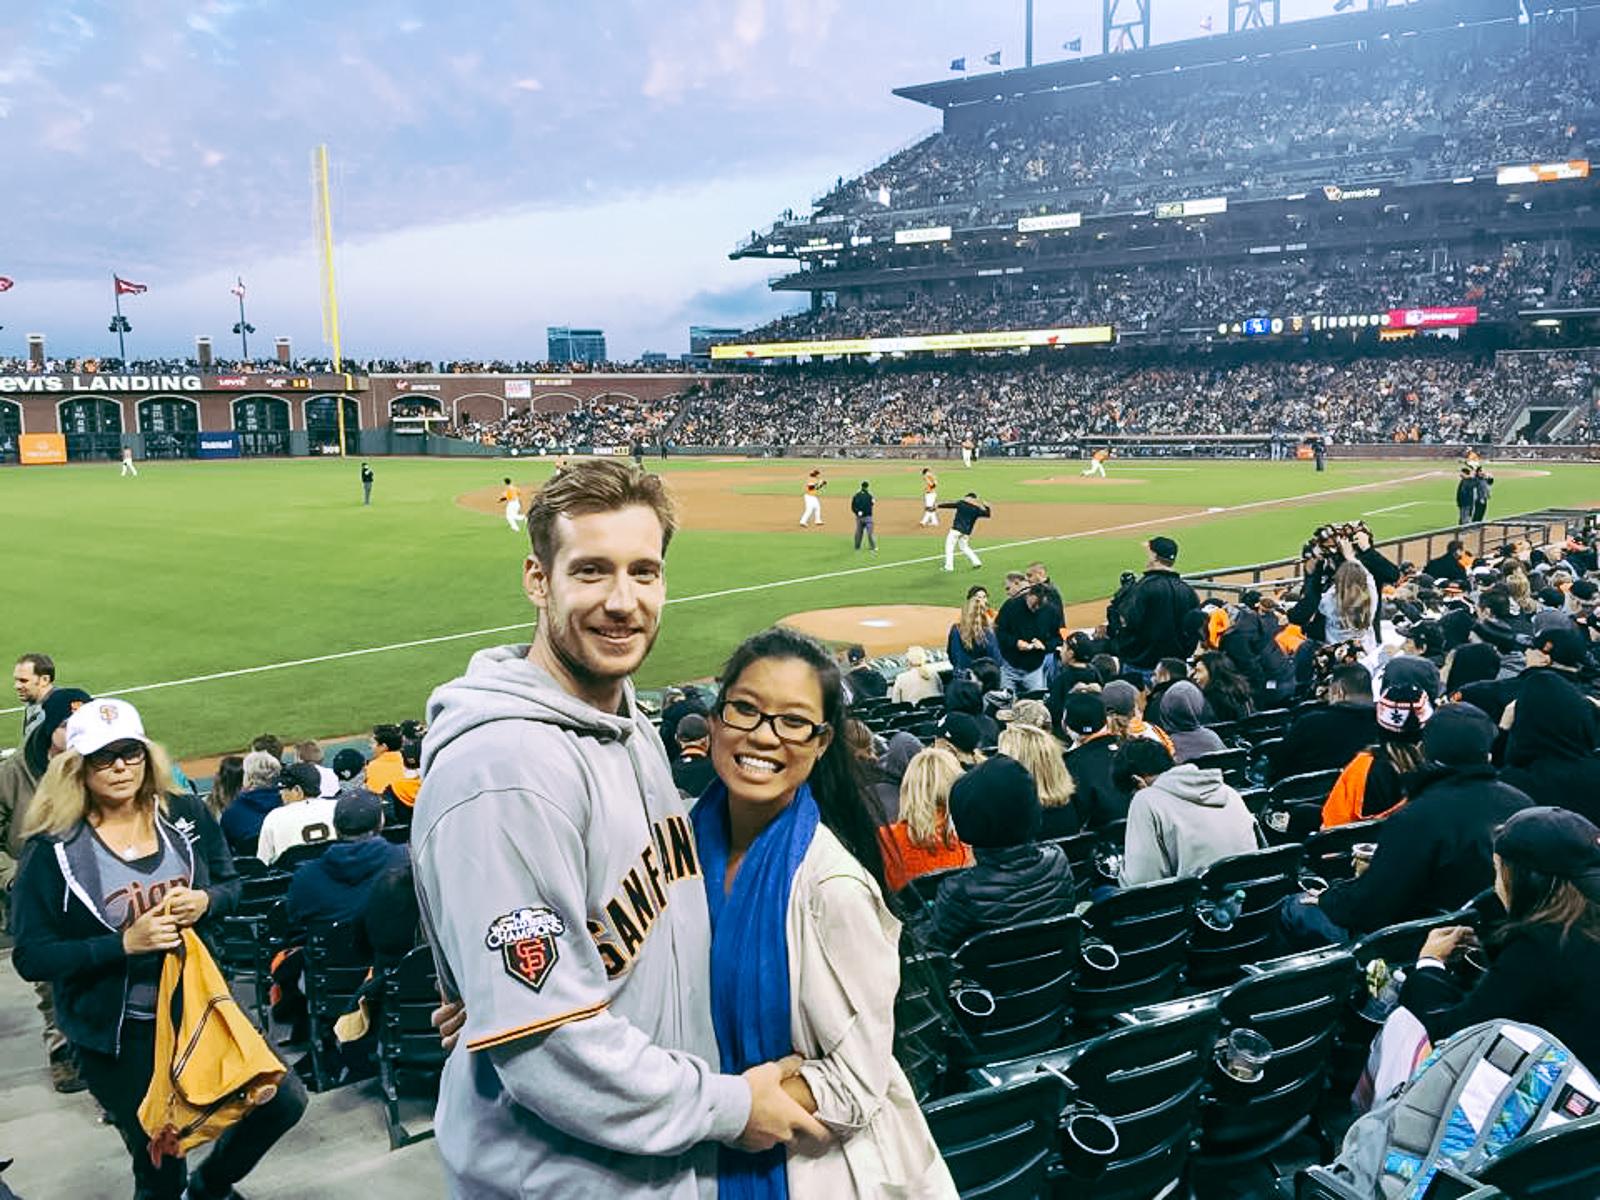 Giants game in San Francisco